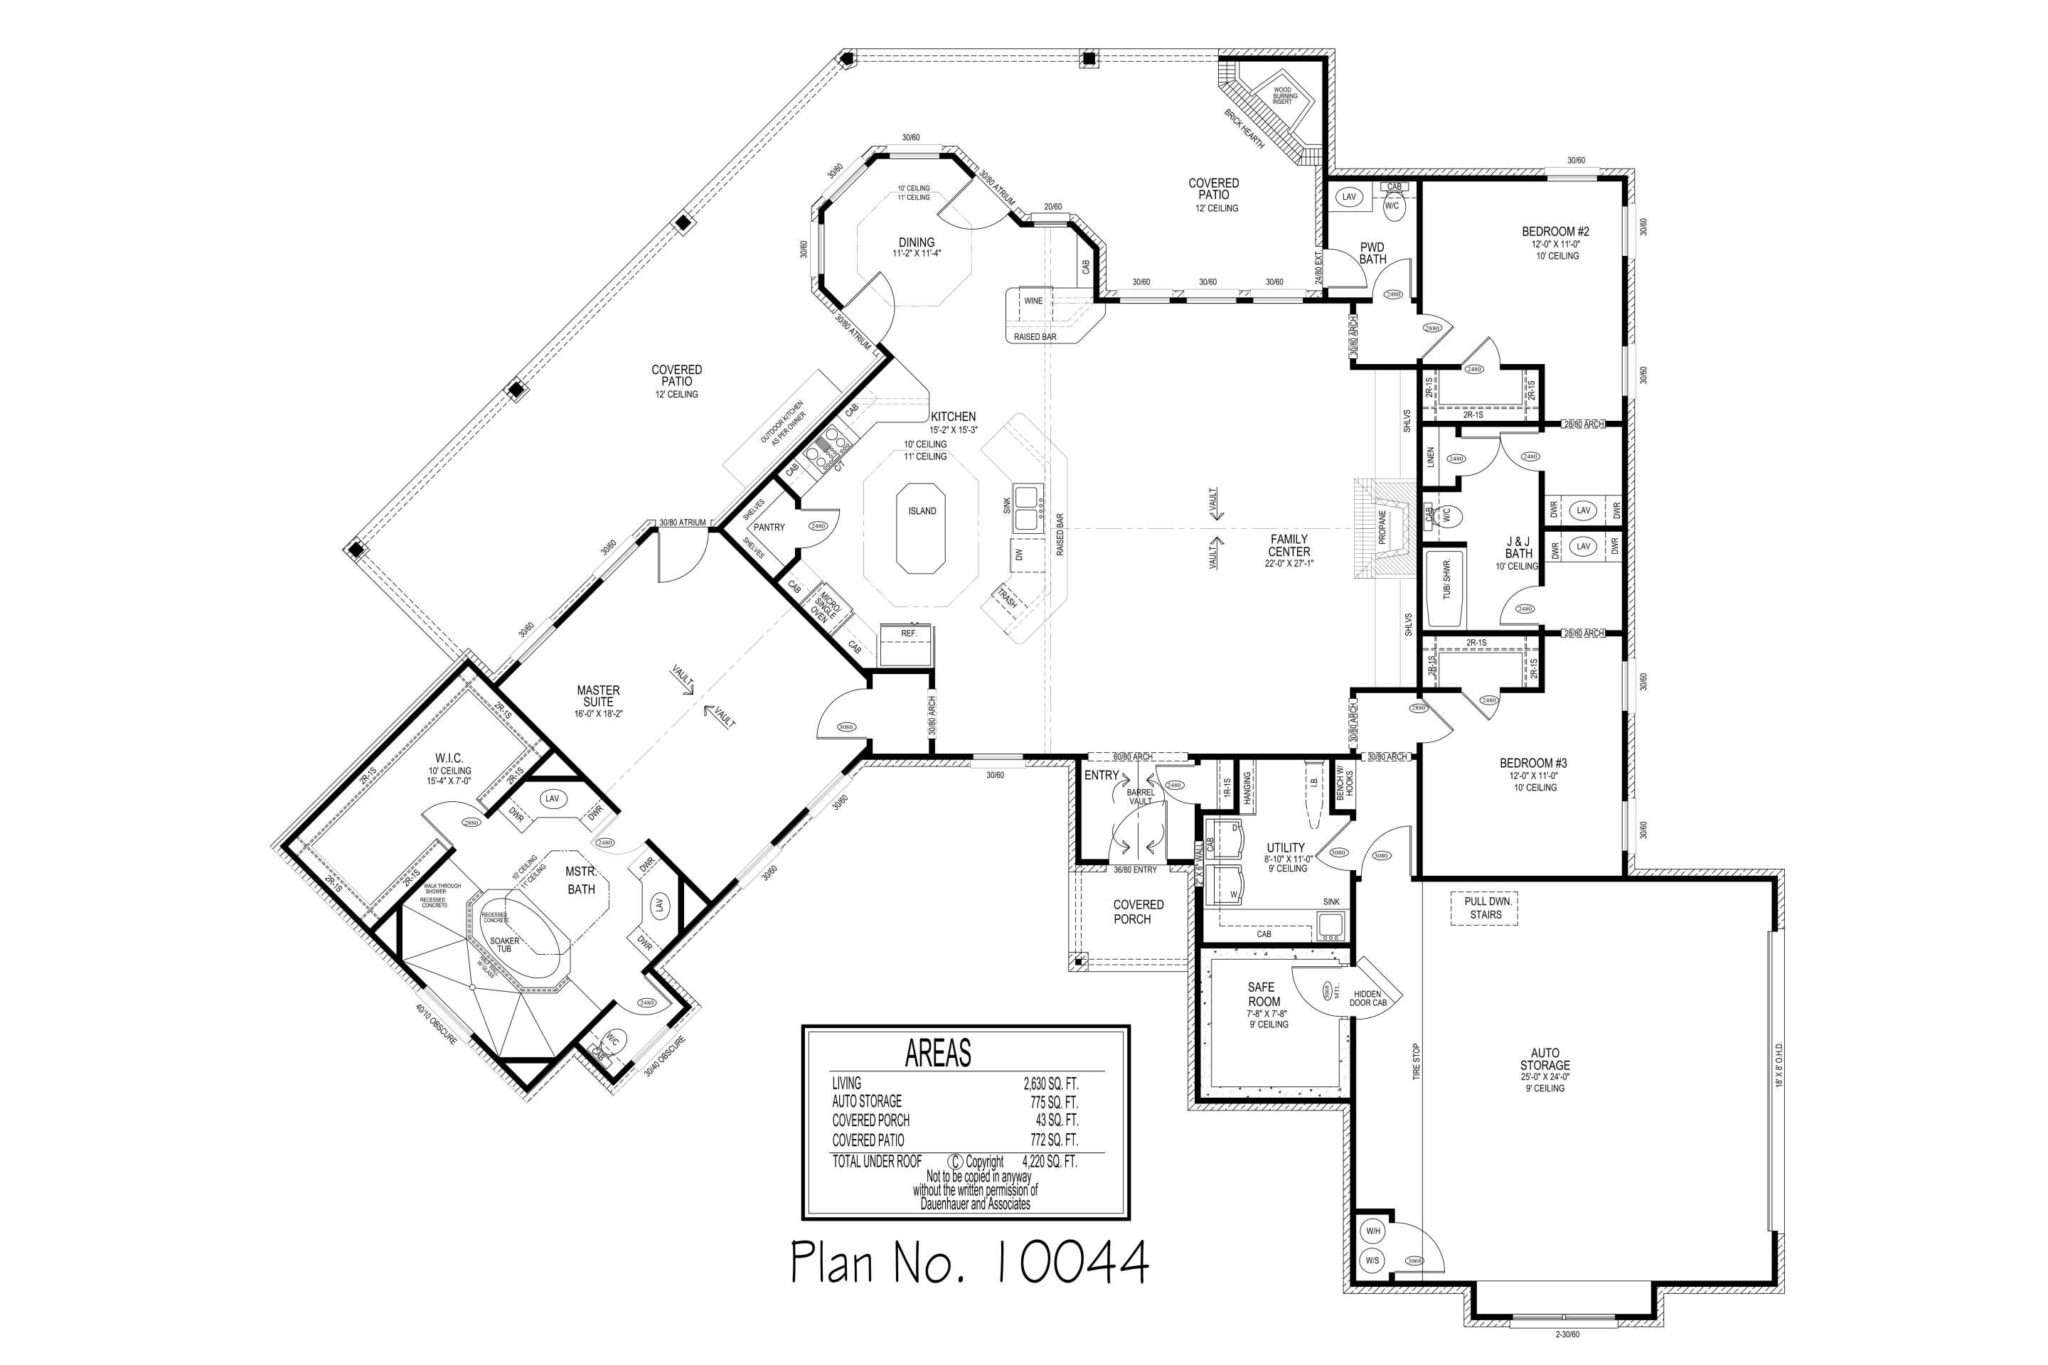 house-plan-10044-floor